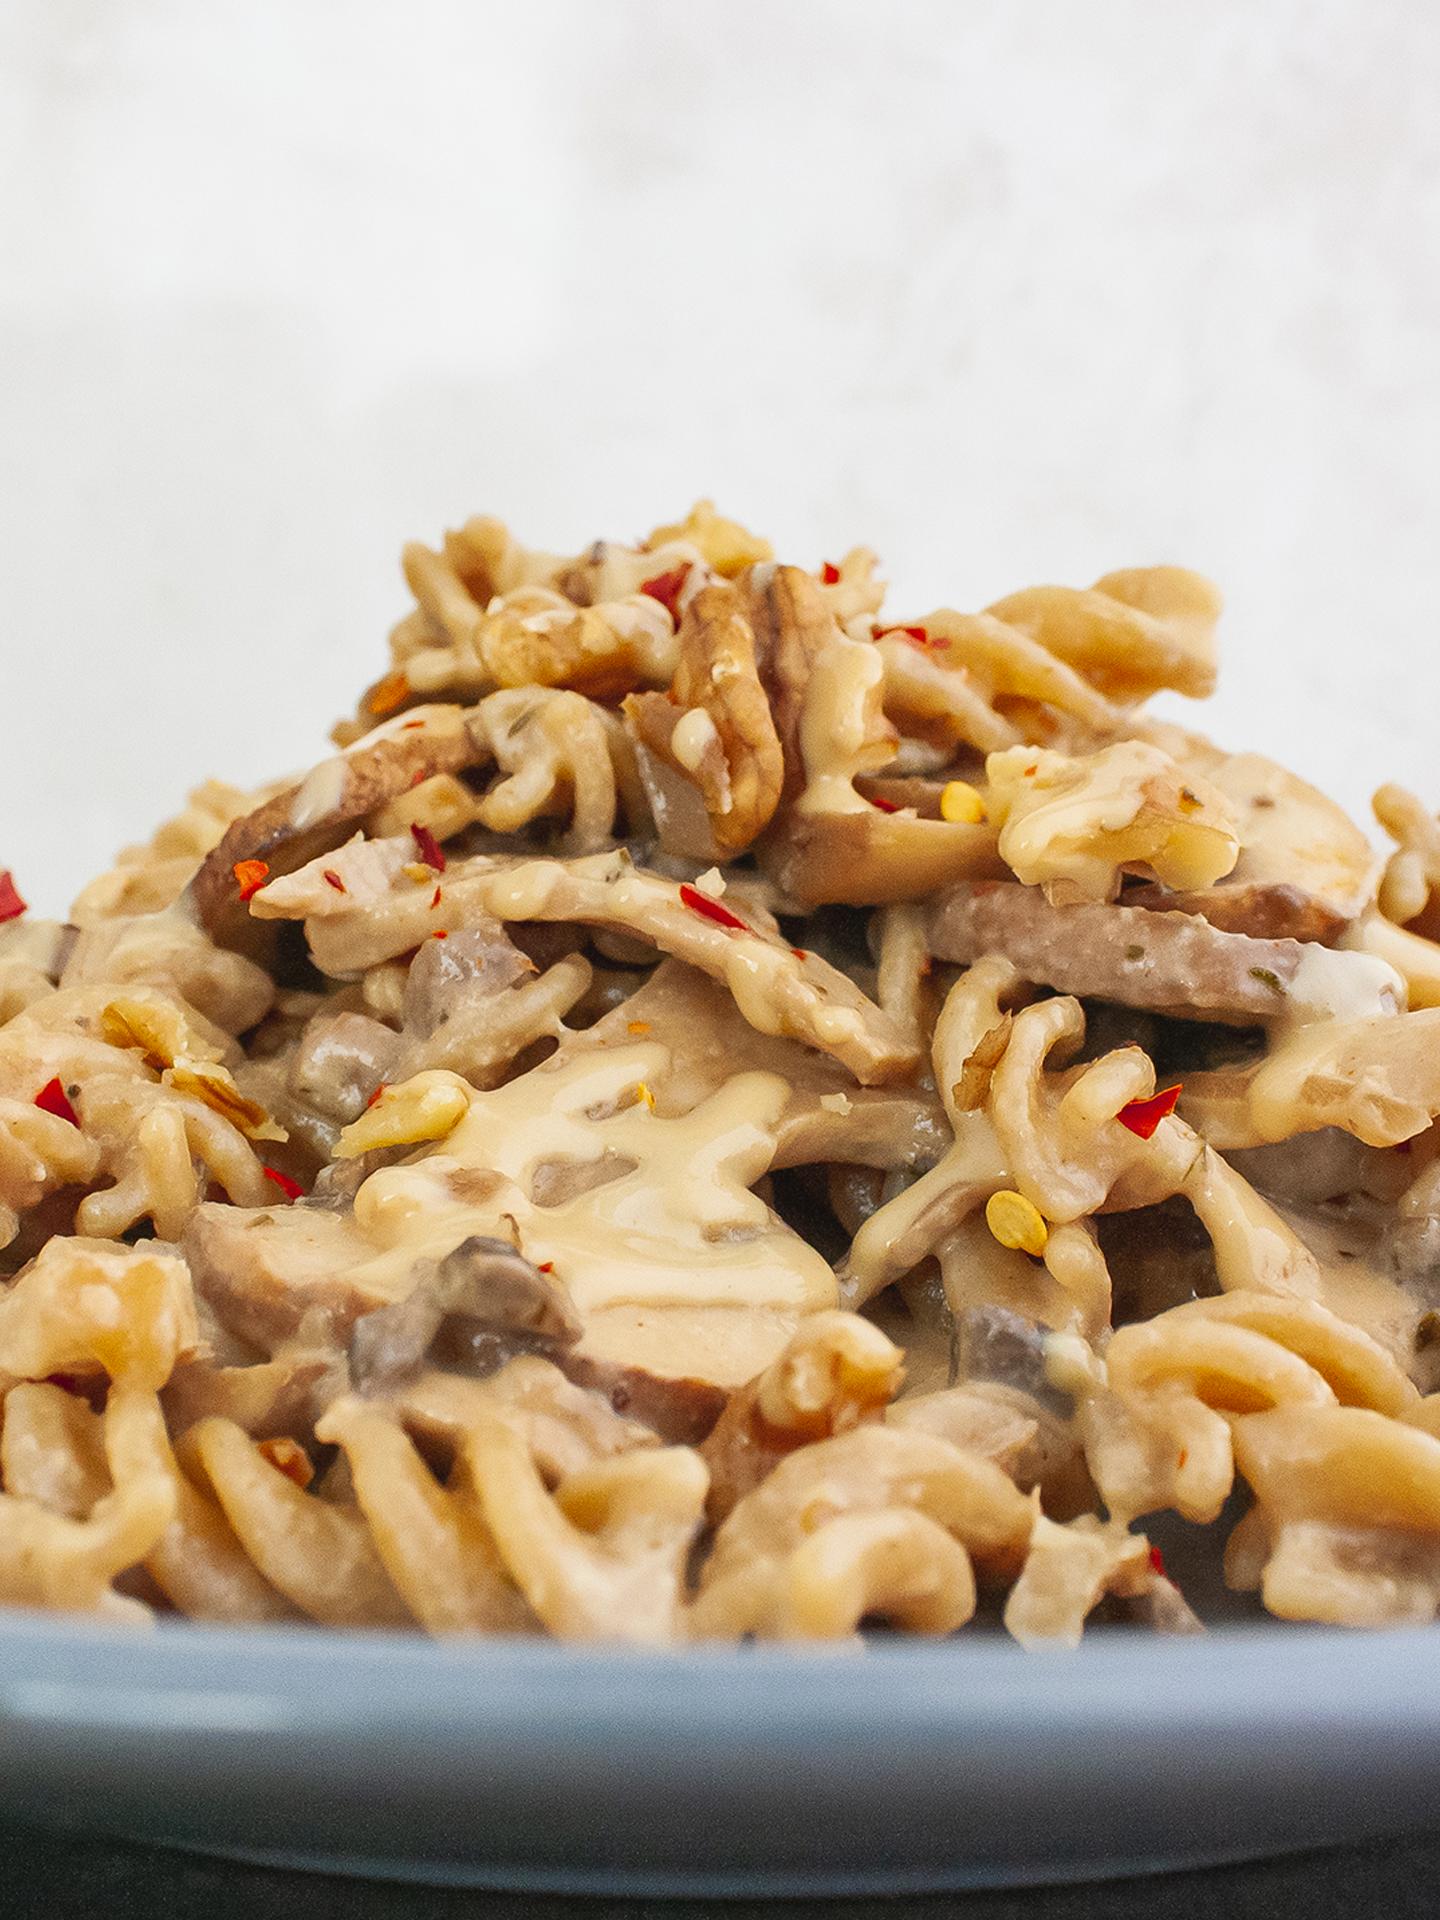 Creamy Vegan Pasta with Spicy Mushrooms, Walnuts and Tahini Sauce Thumbnail